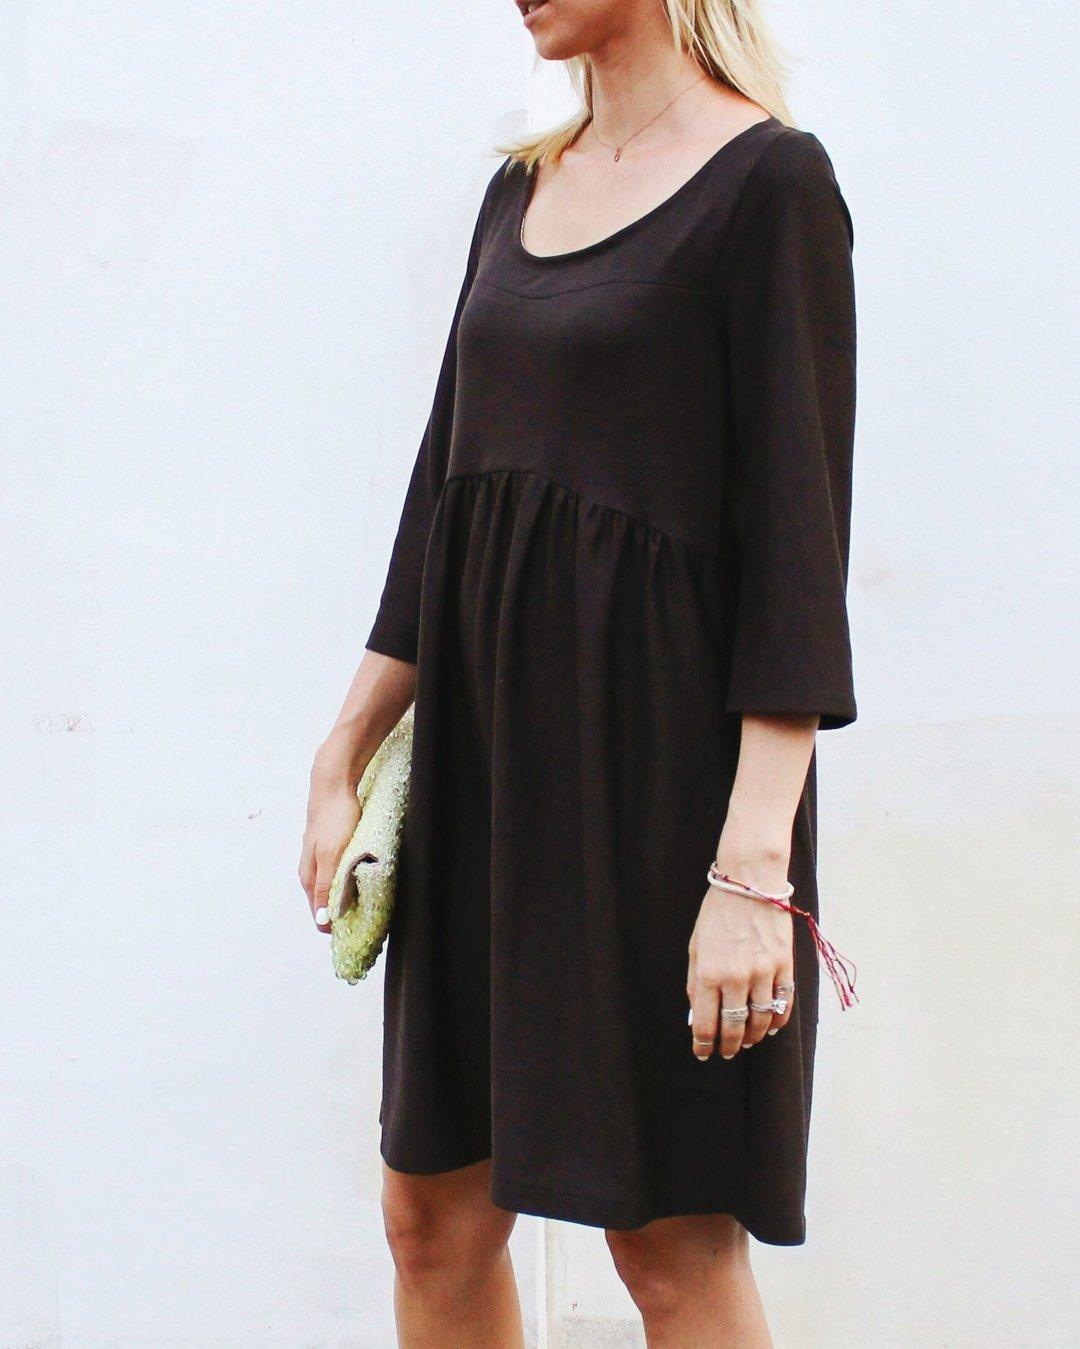 Cali Faye Collection - Gardenia Dress Pattern